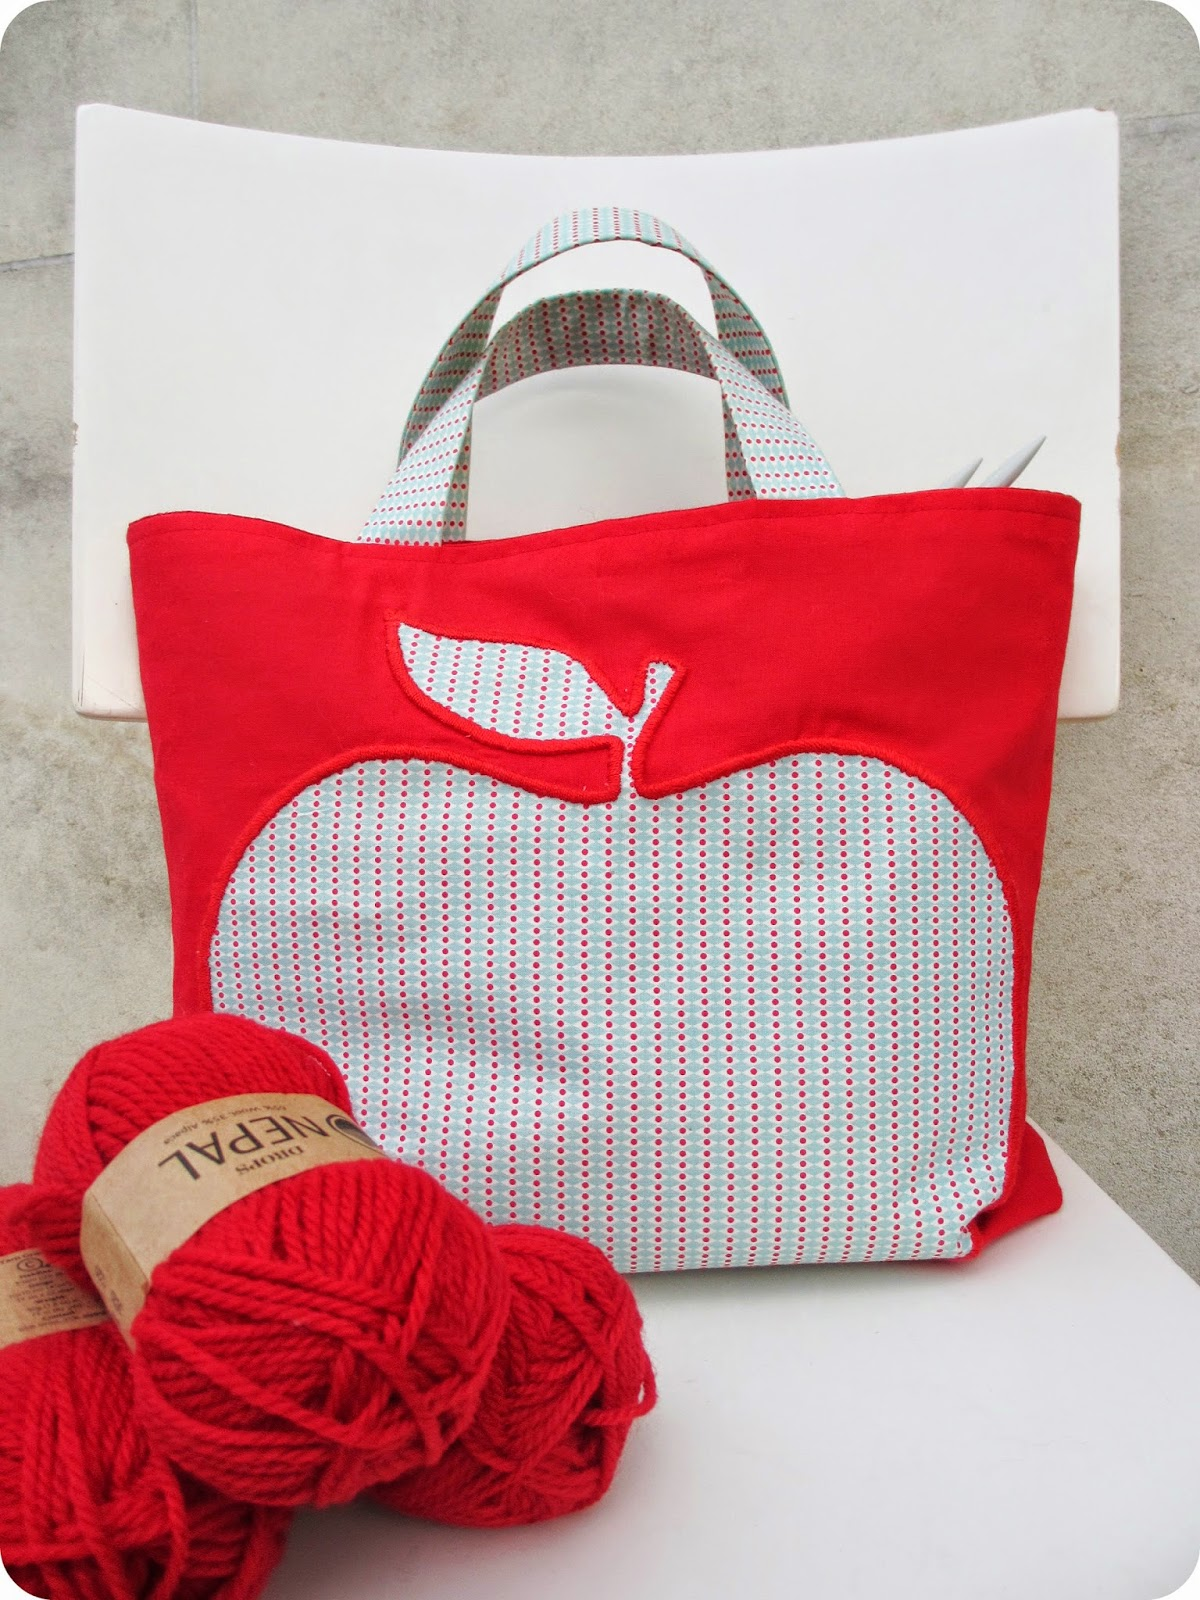 Tadaam diy tuto sac tricot - Tuto sac tricot en tissu ...